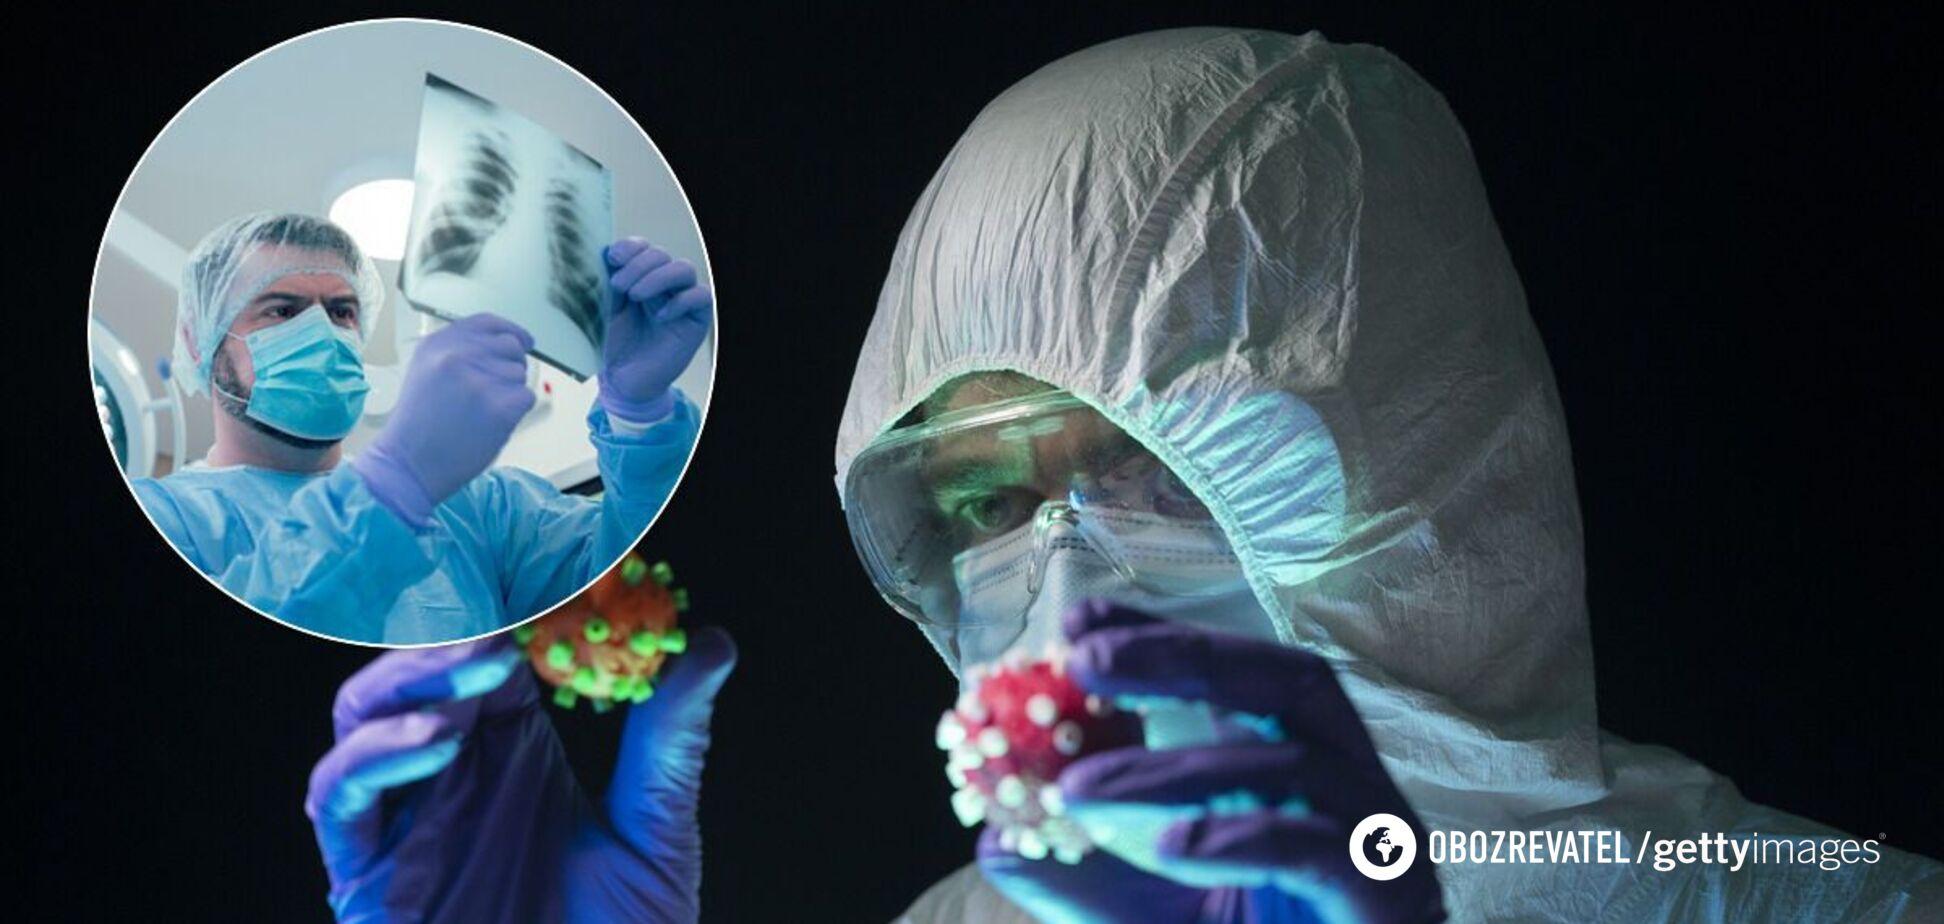 Ученые заявили о 'самом эффективном' препарате от коронавируса